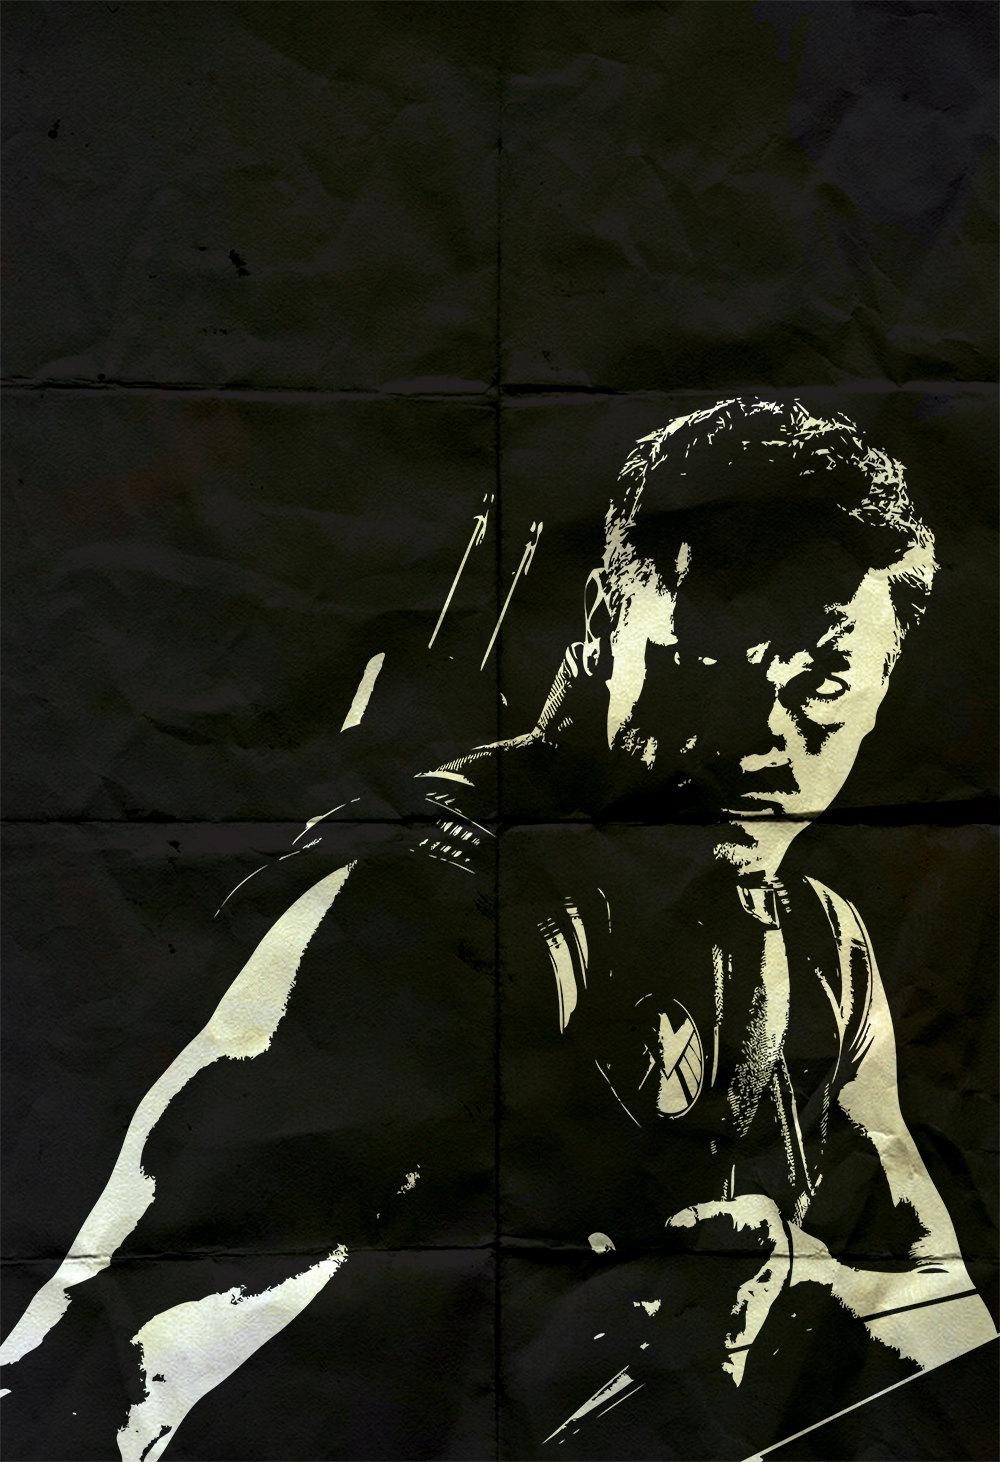 Hawkeye avengers poster marvel comics superhero movie illustration